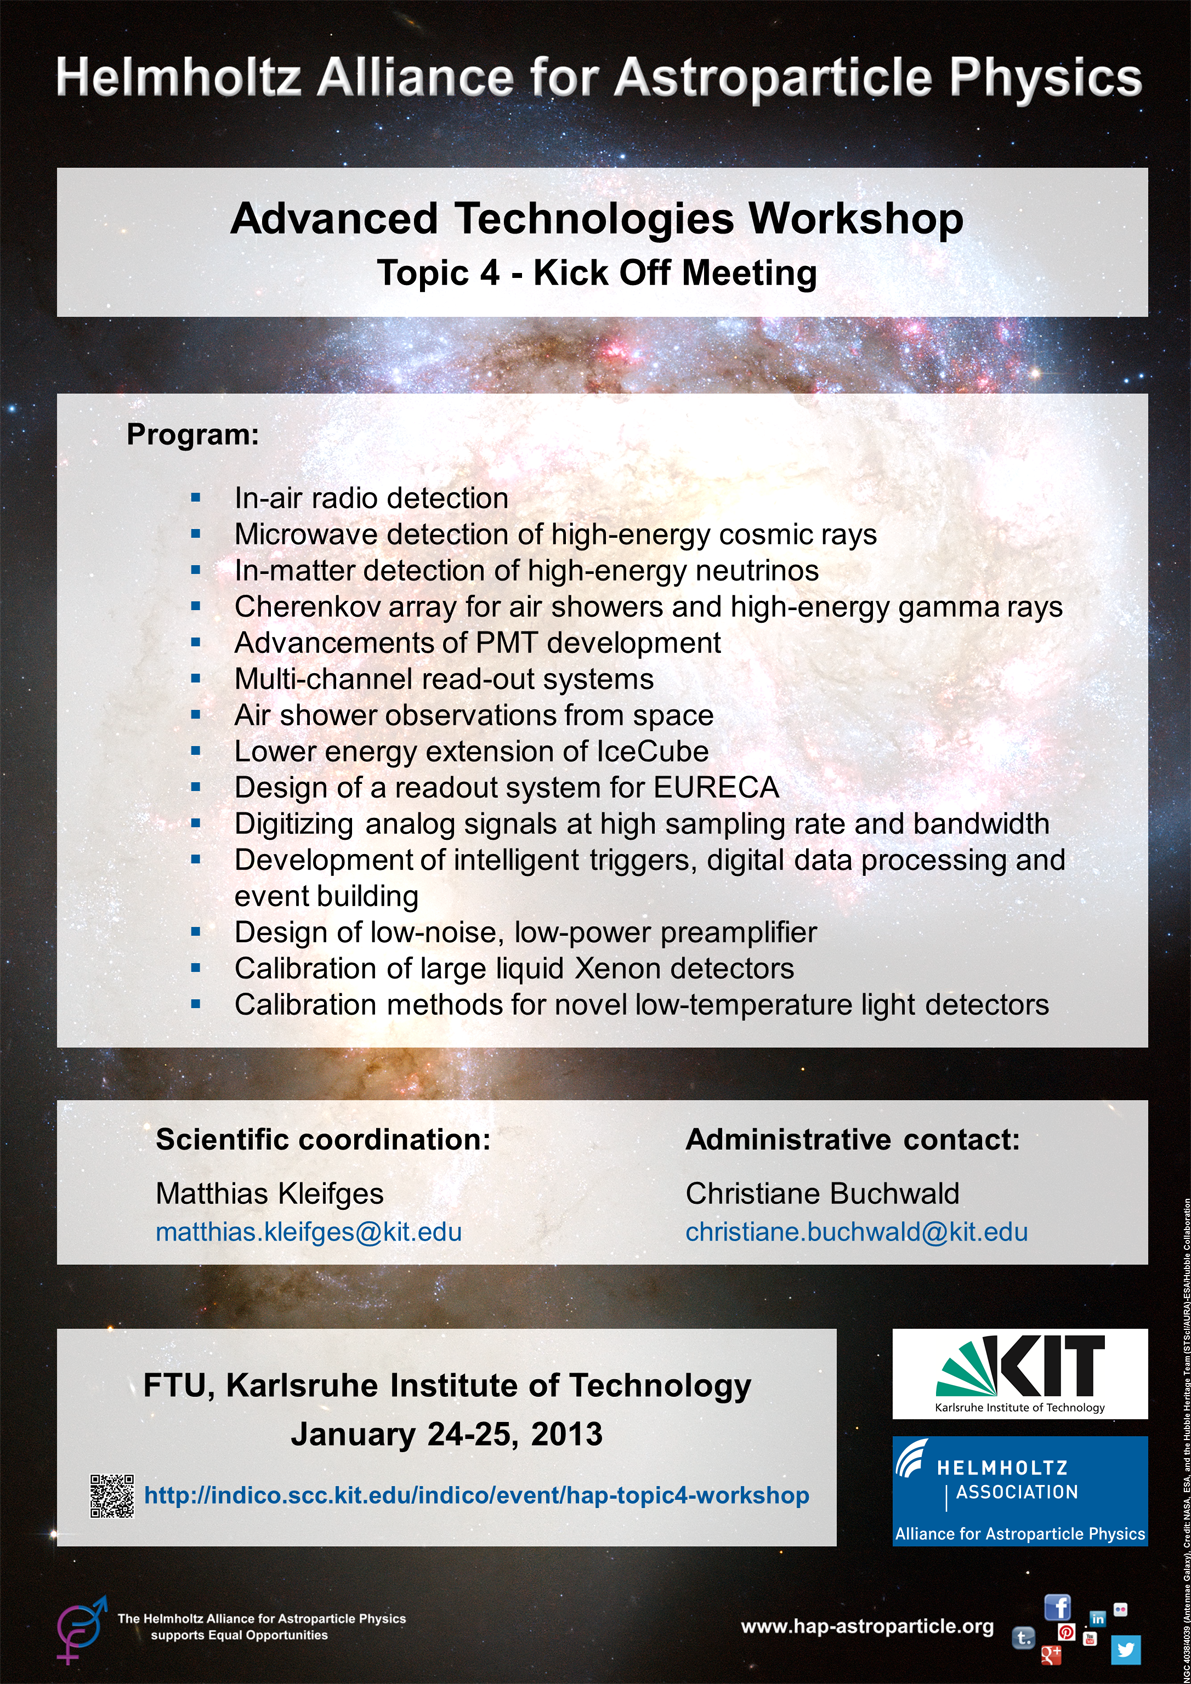 HAP - Advanced Technologies Kick Off Meeting